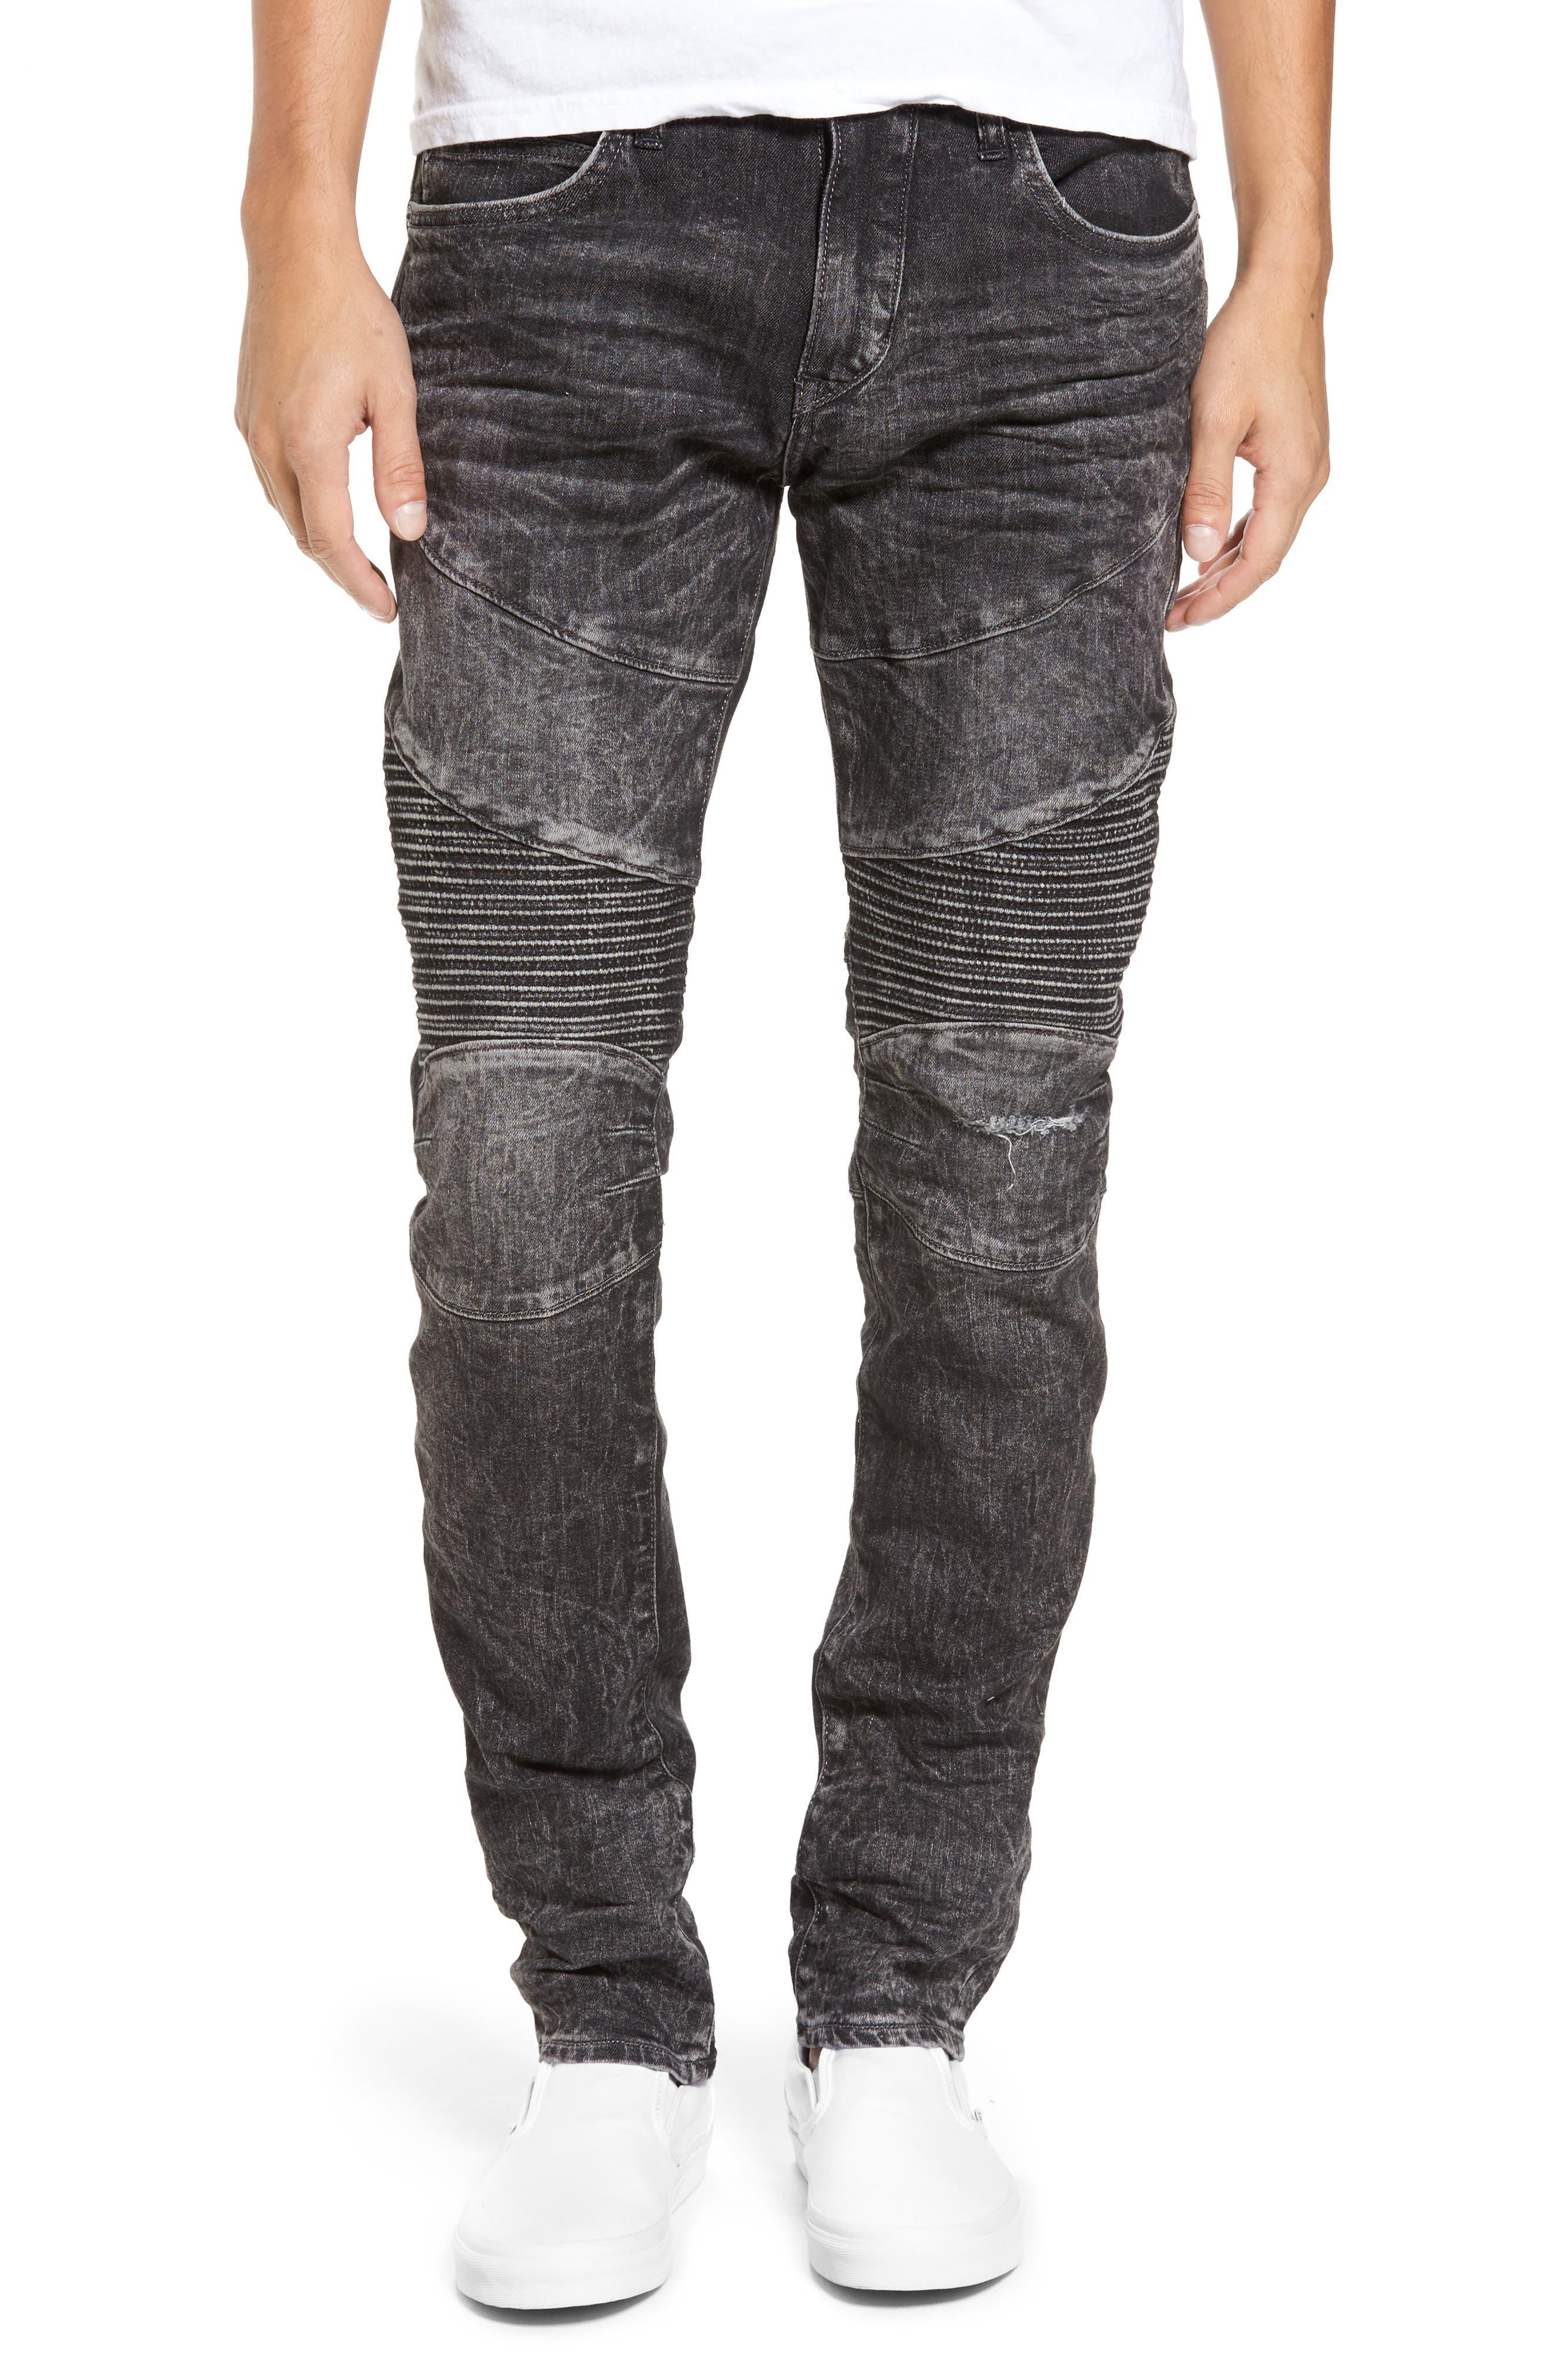 True Religion Brand Jeans Rocco Skinny Fit Jeans (Dark Raven)